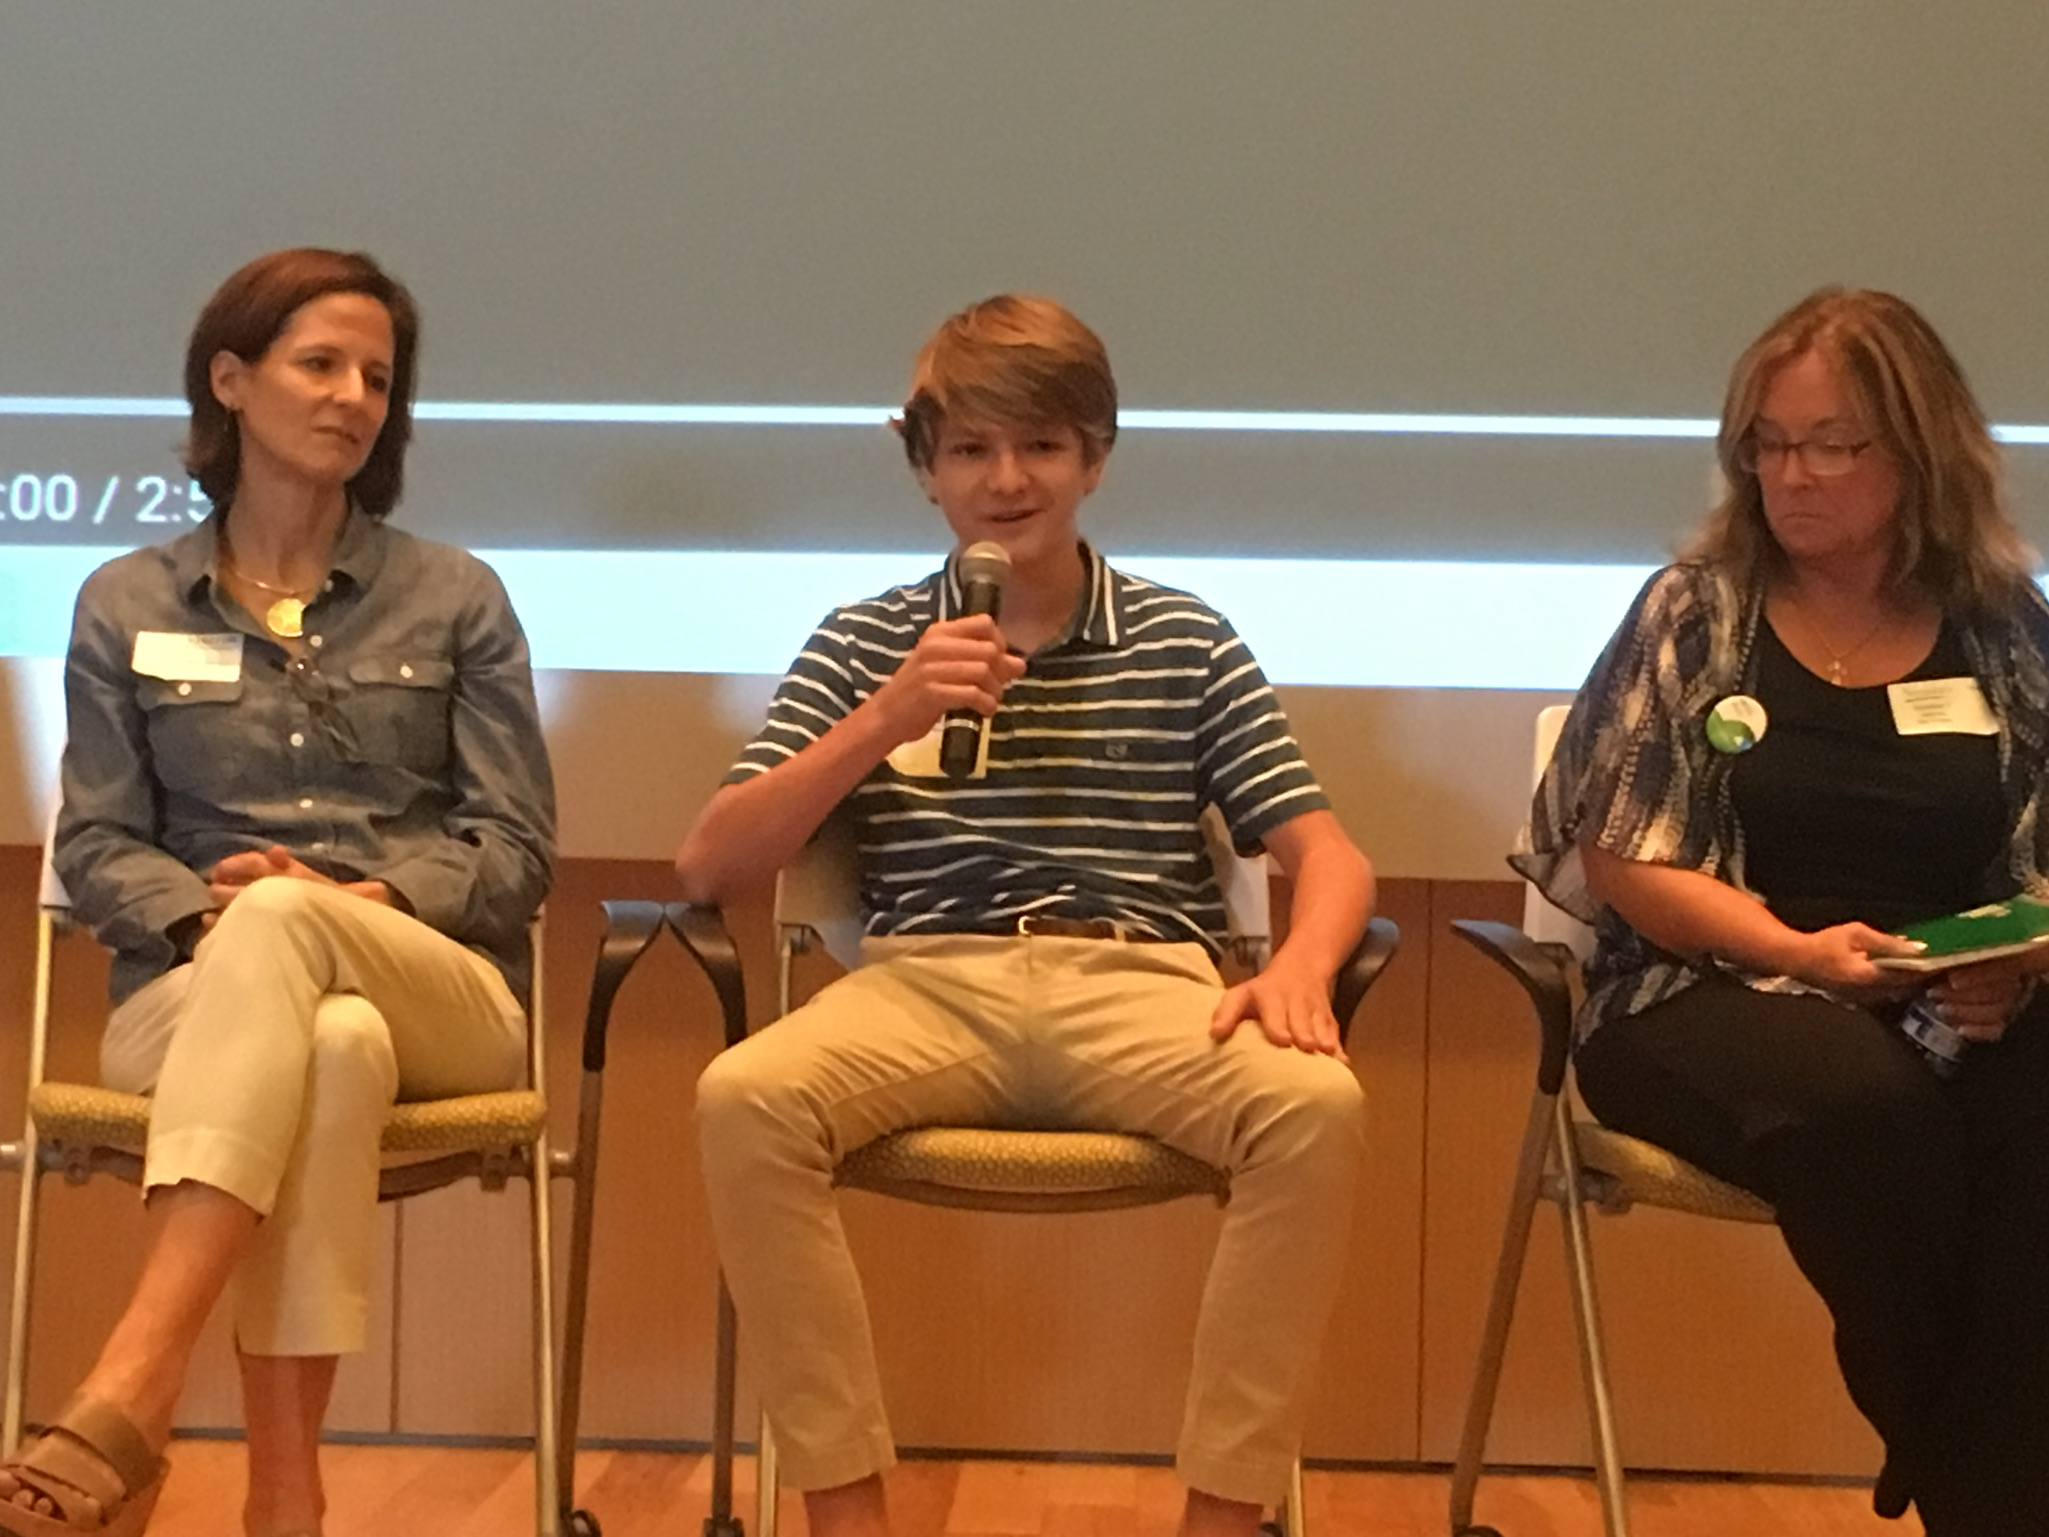 Speaking on the panel